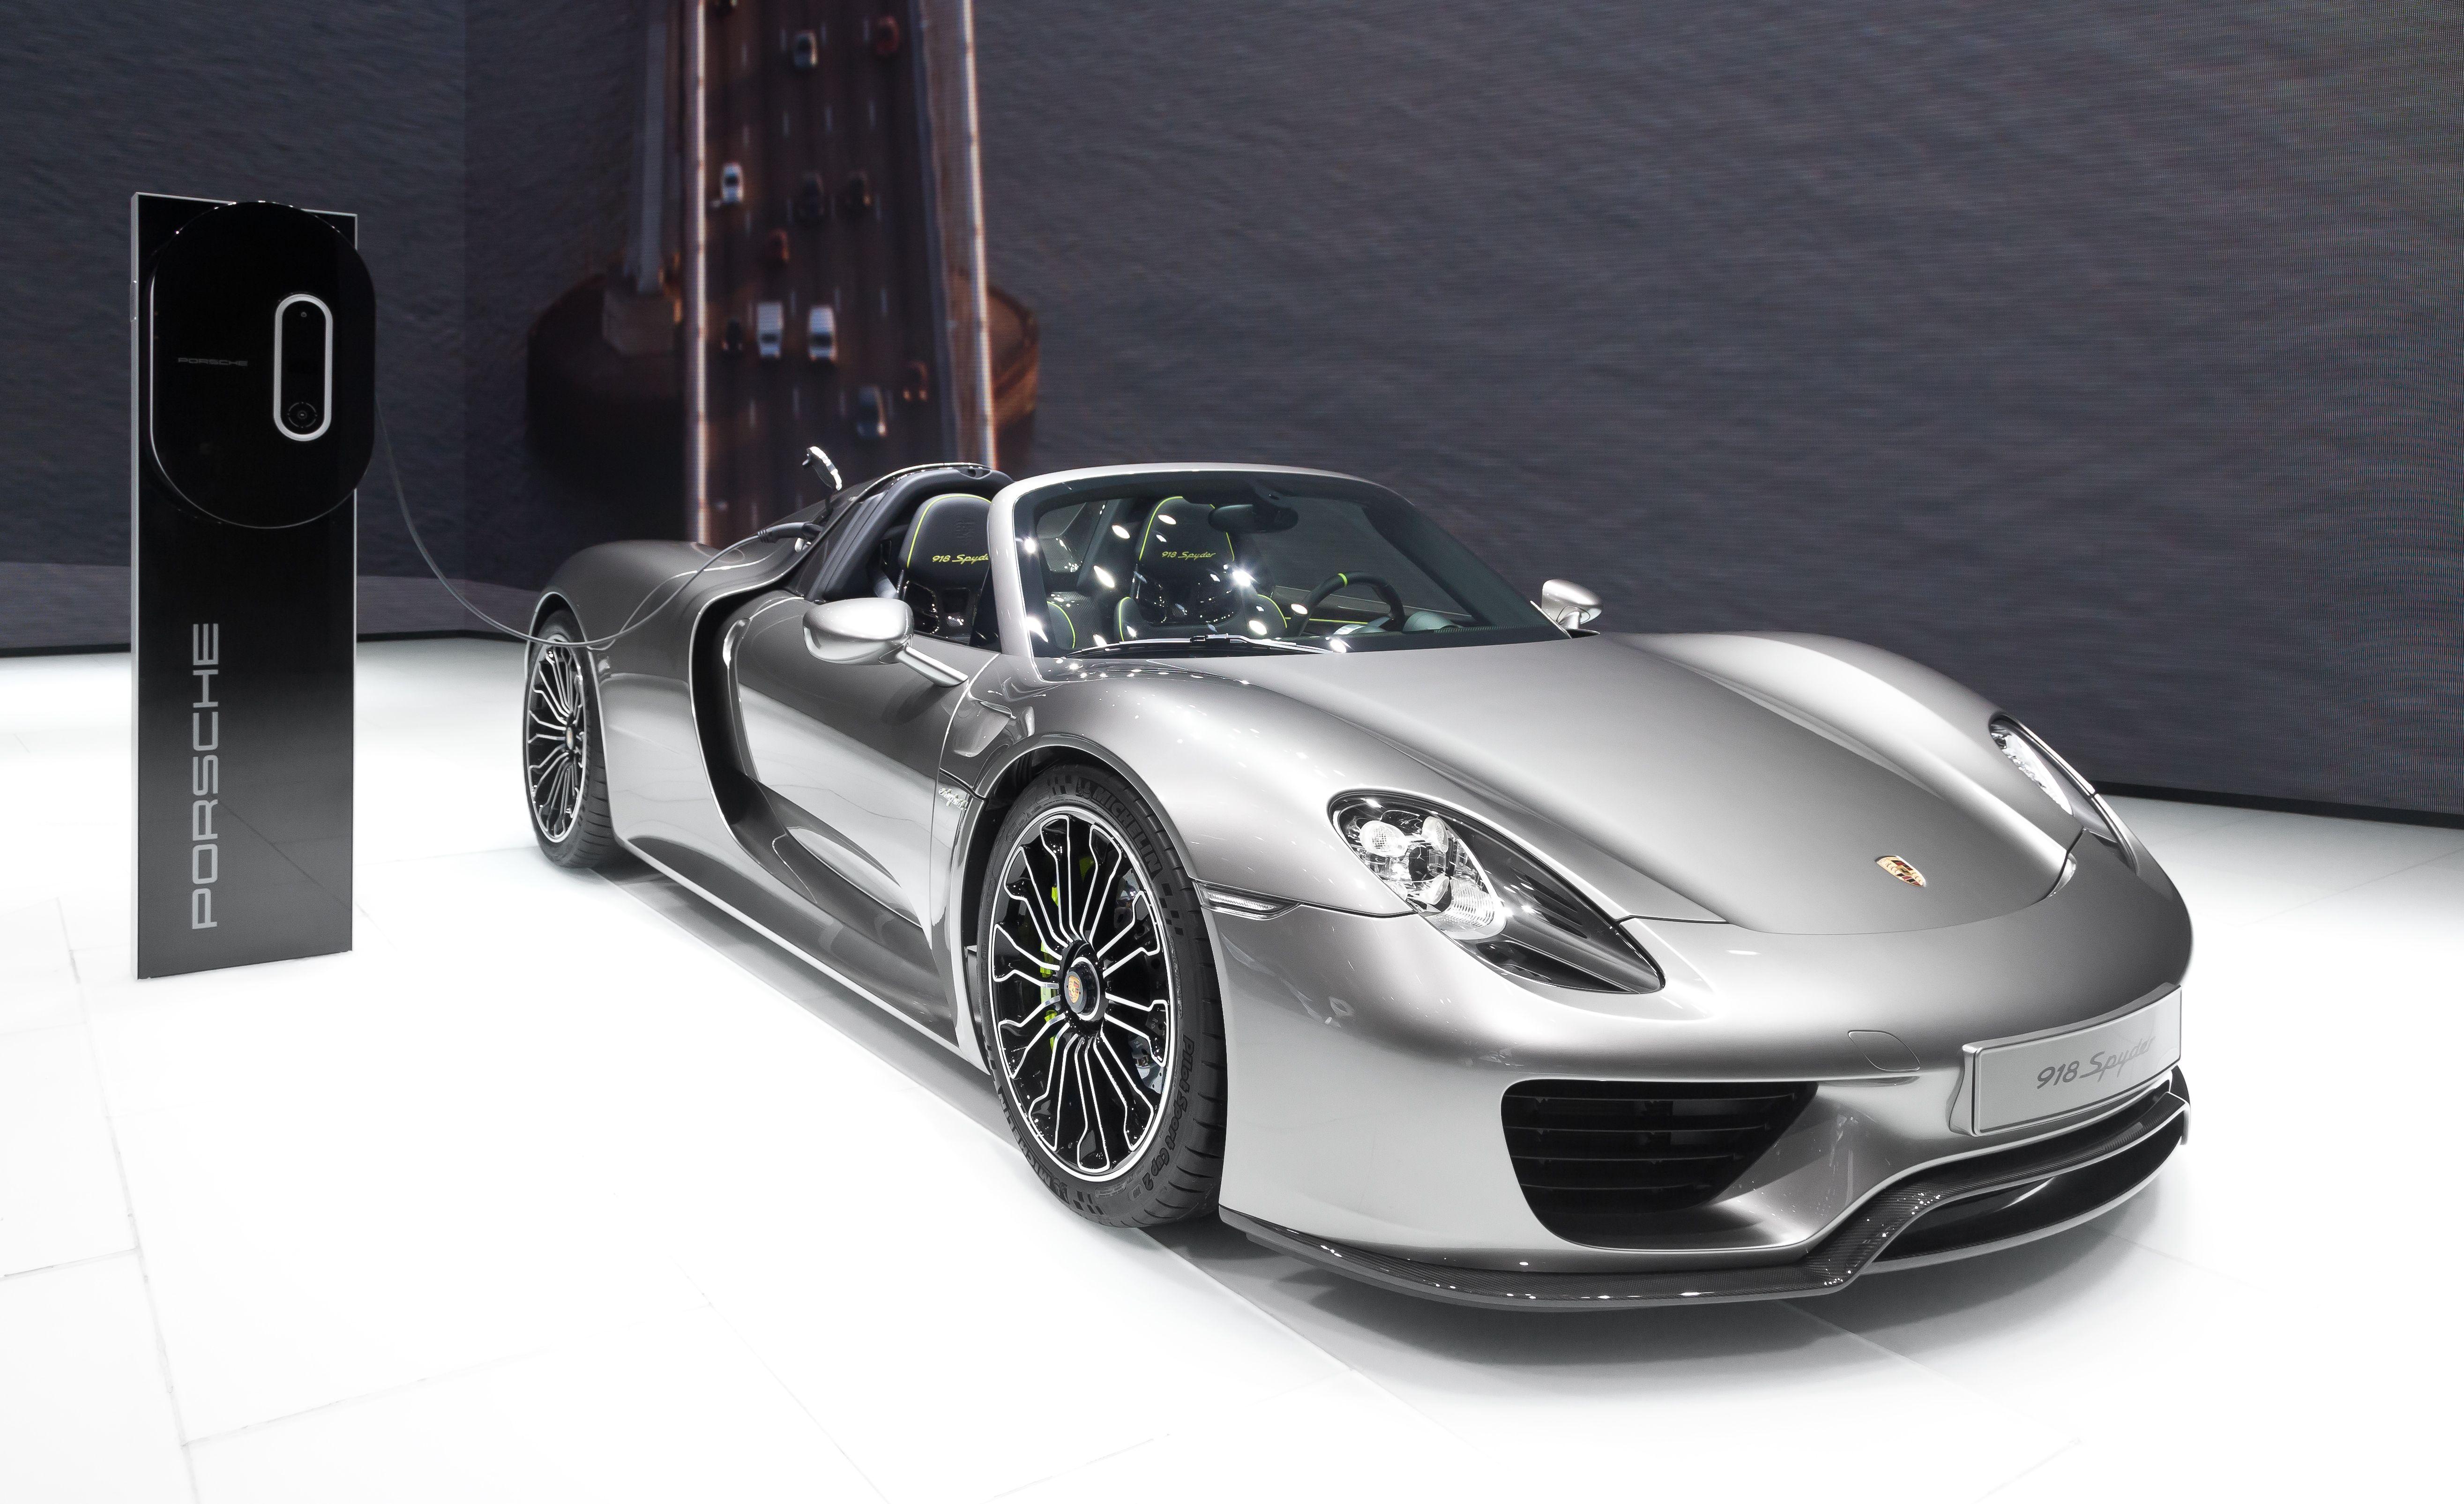 288f6955f02c7faa967b839542f95de1 Mesmerizing Porsche 918 Spyder London Ontario Cars Trend